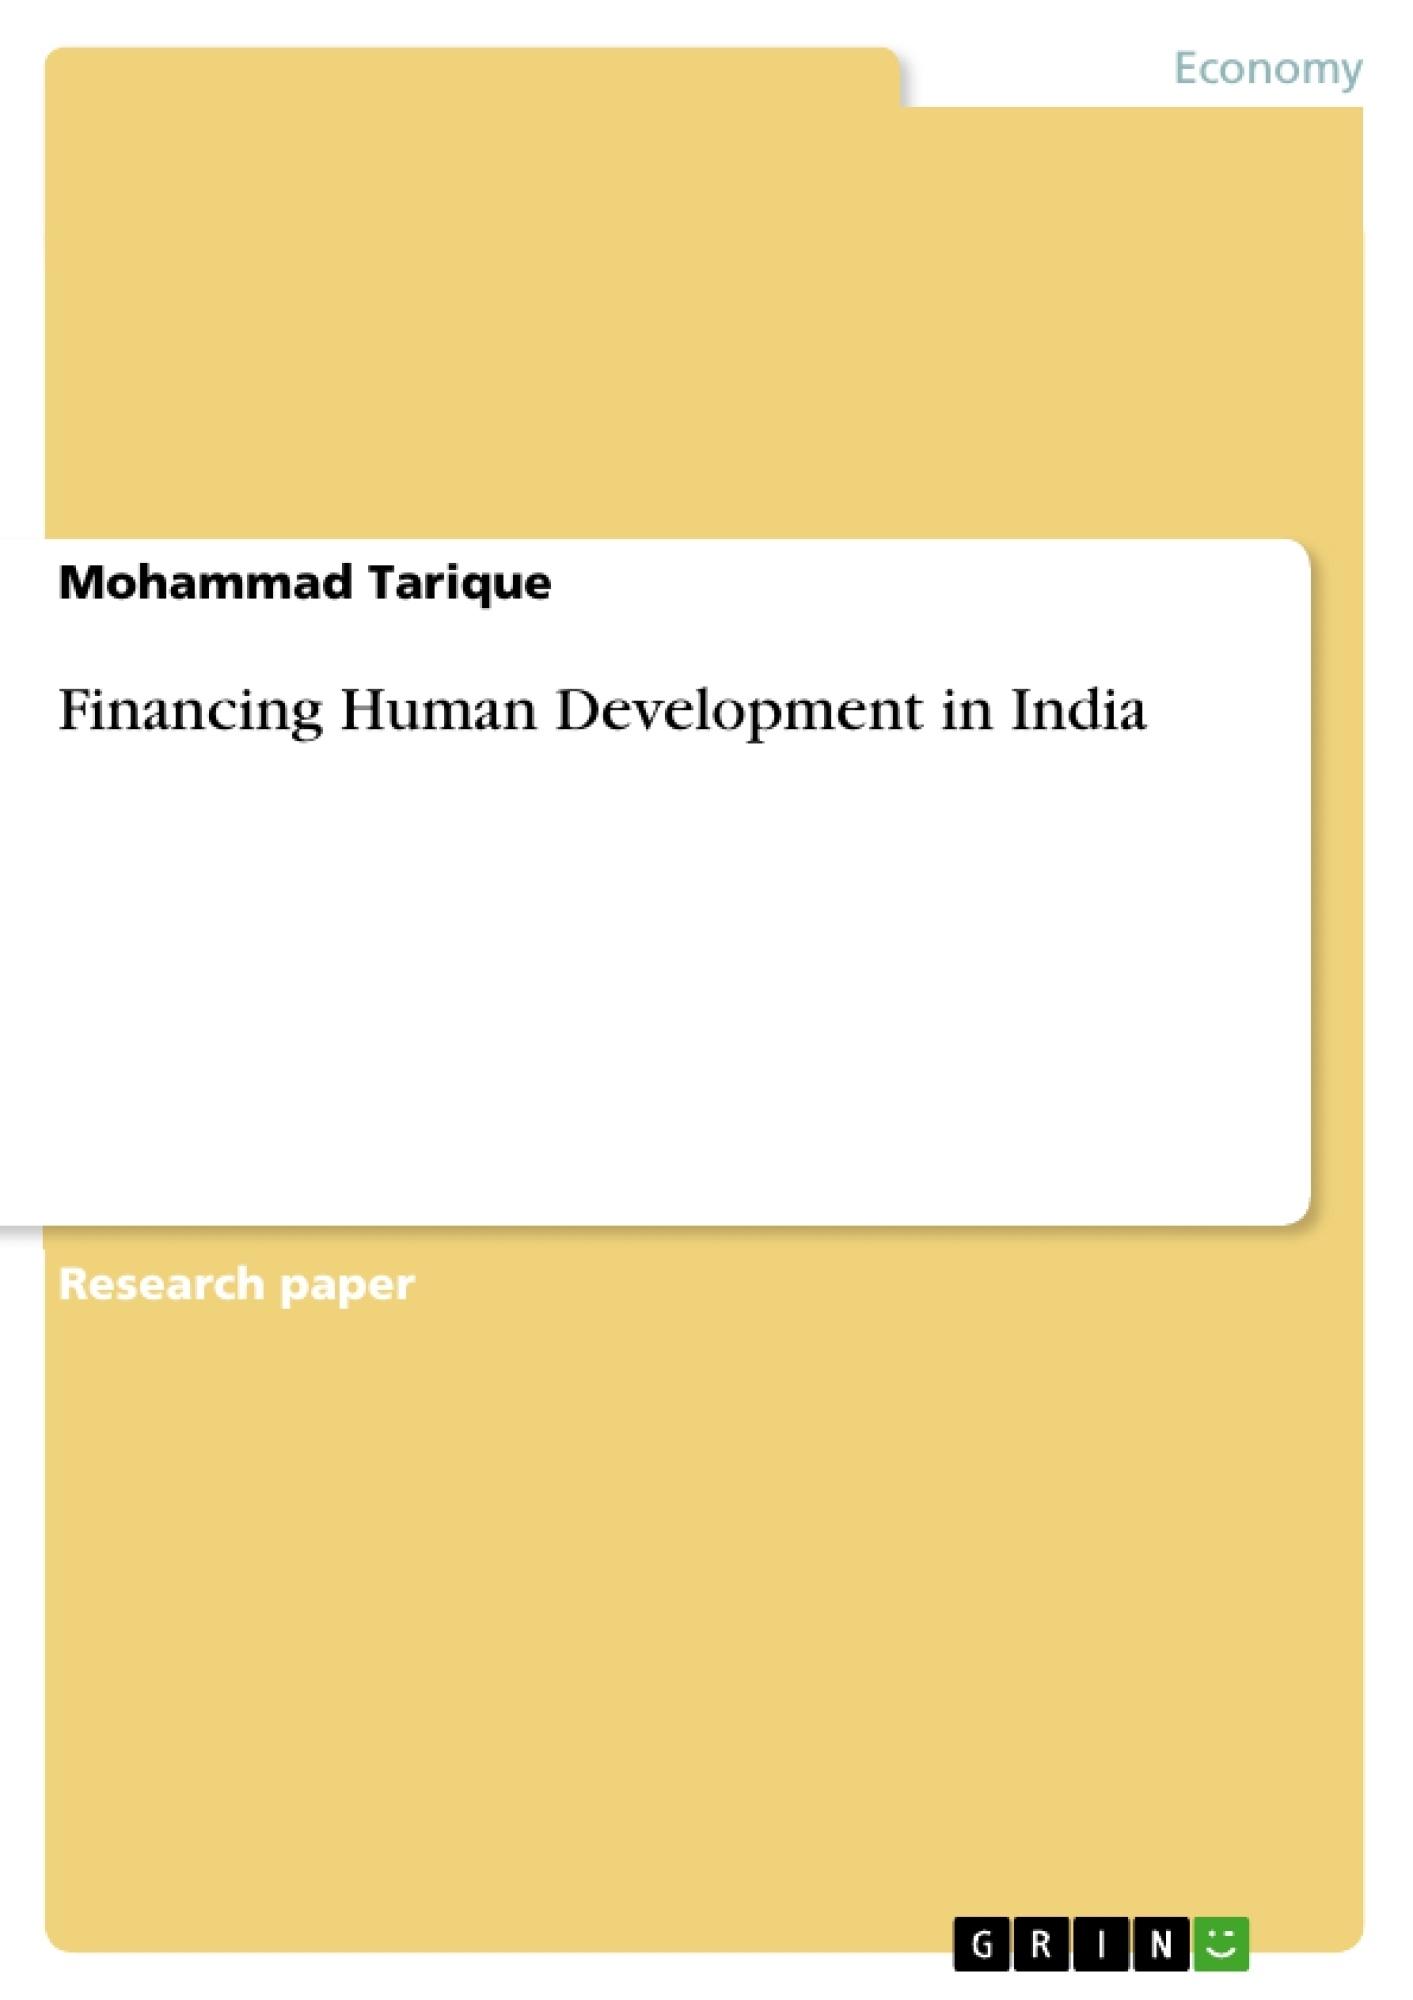 Title: Financing Human Development in India